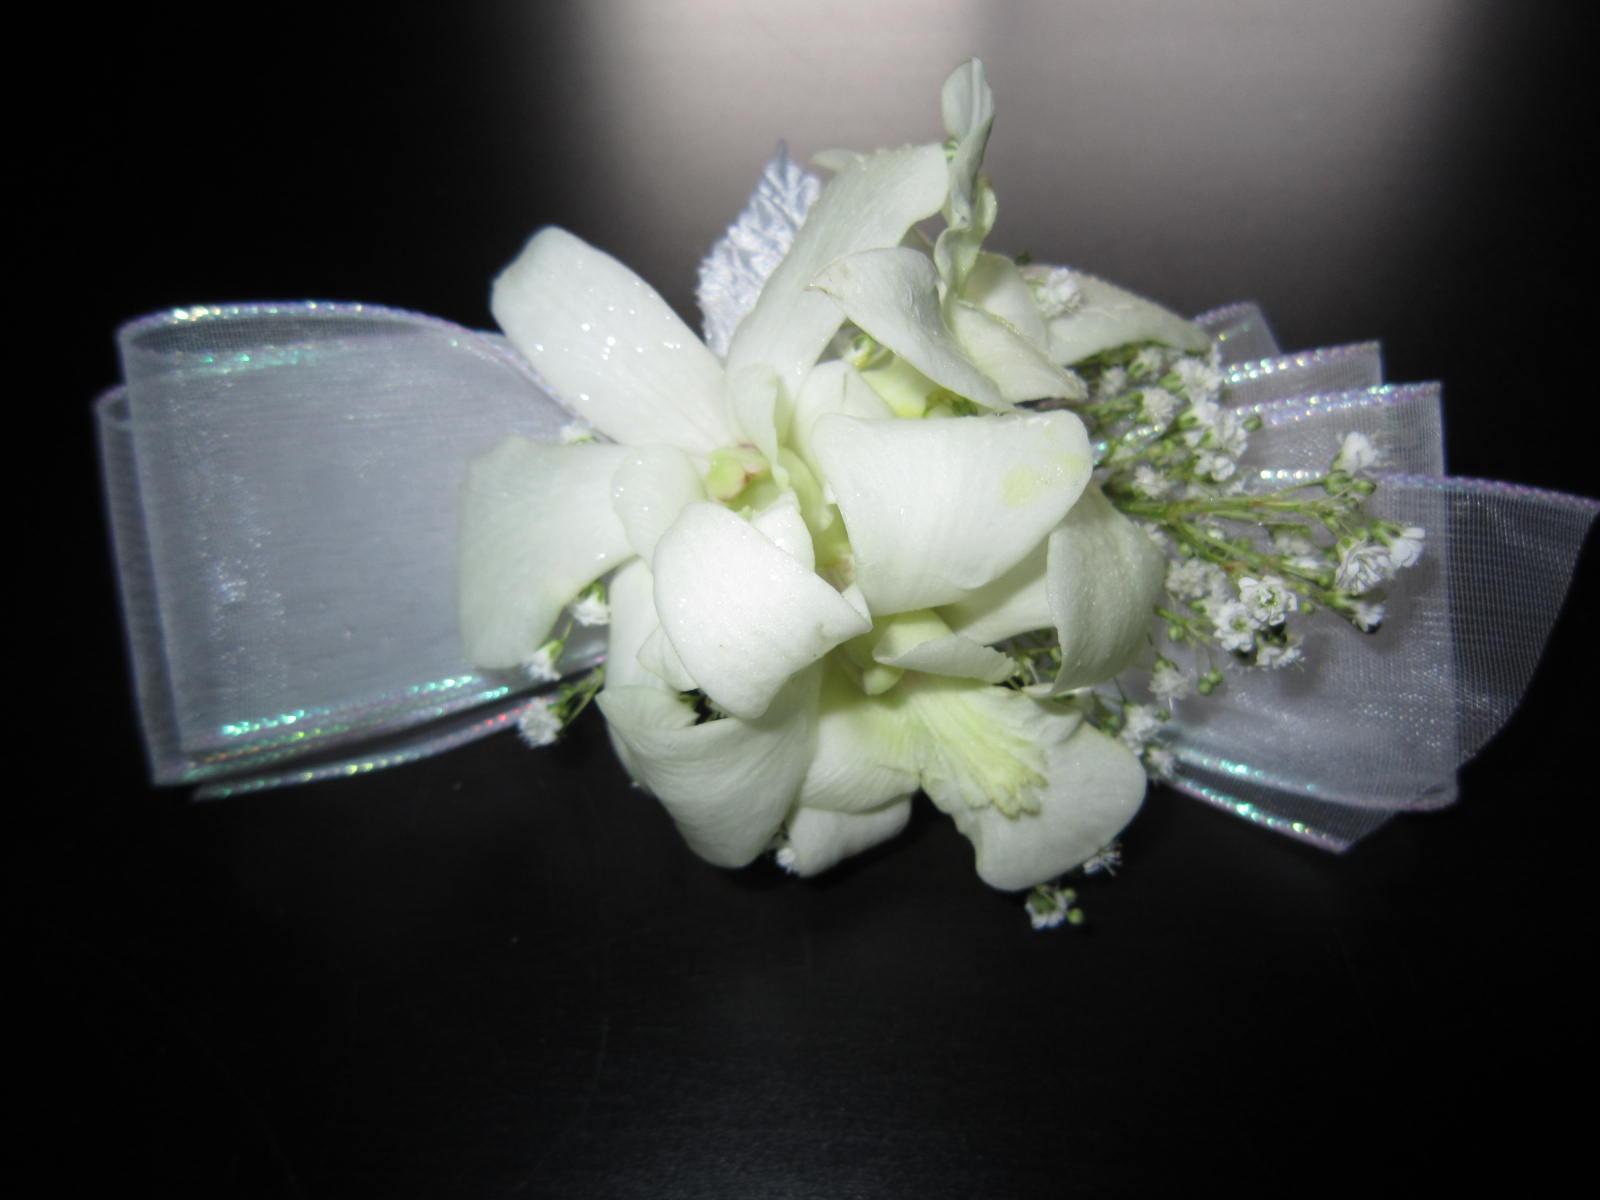 Wedding Flowers Set The Mood Decor Page 5